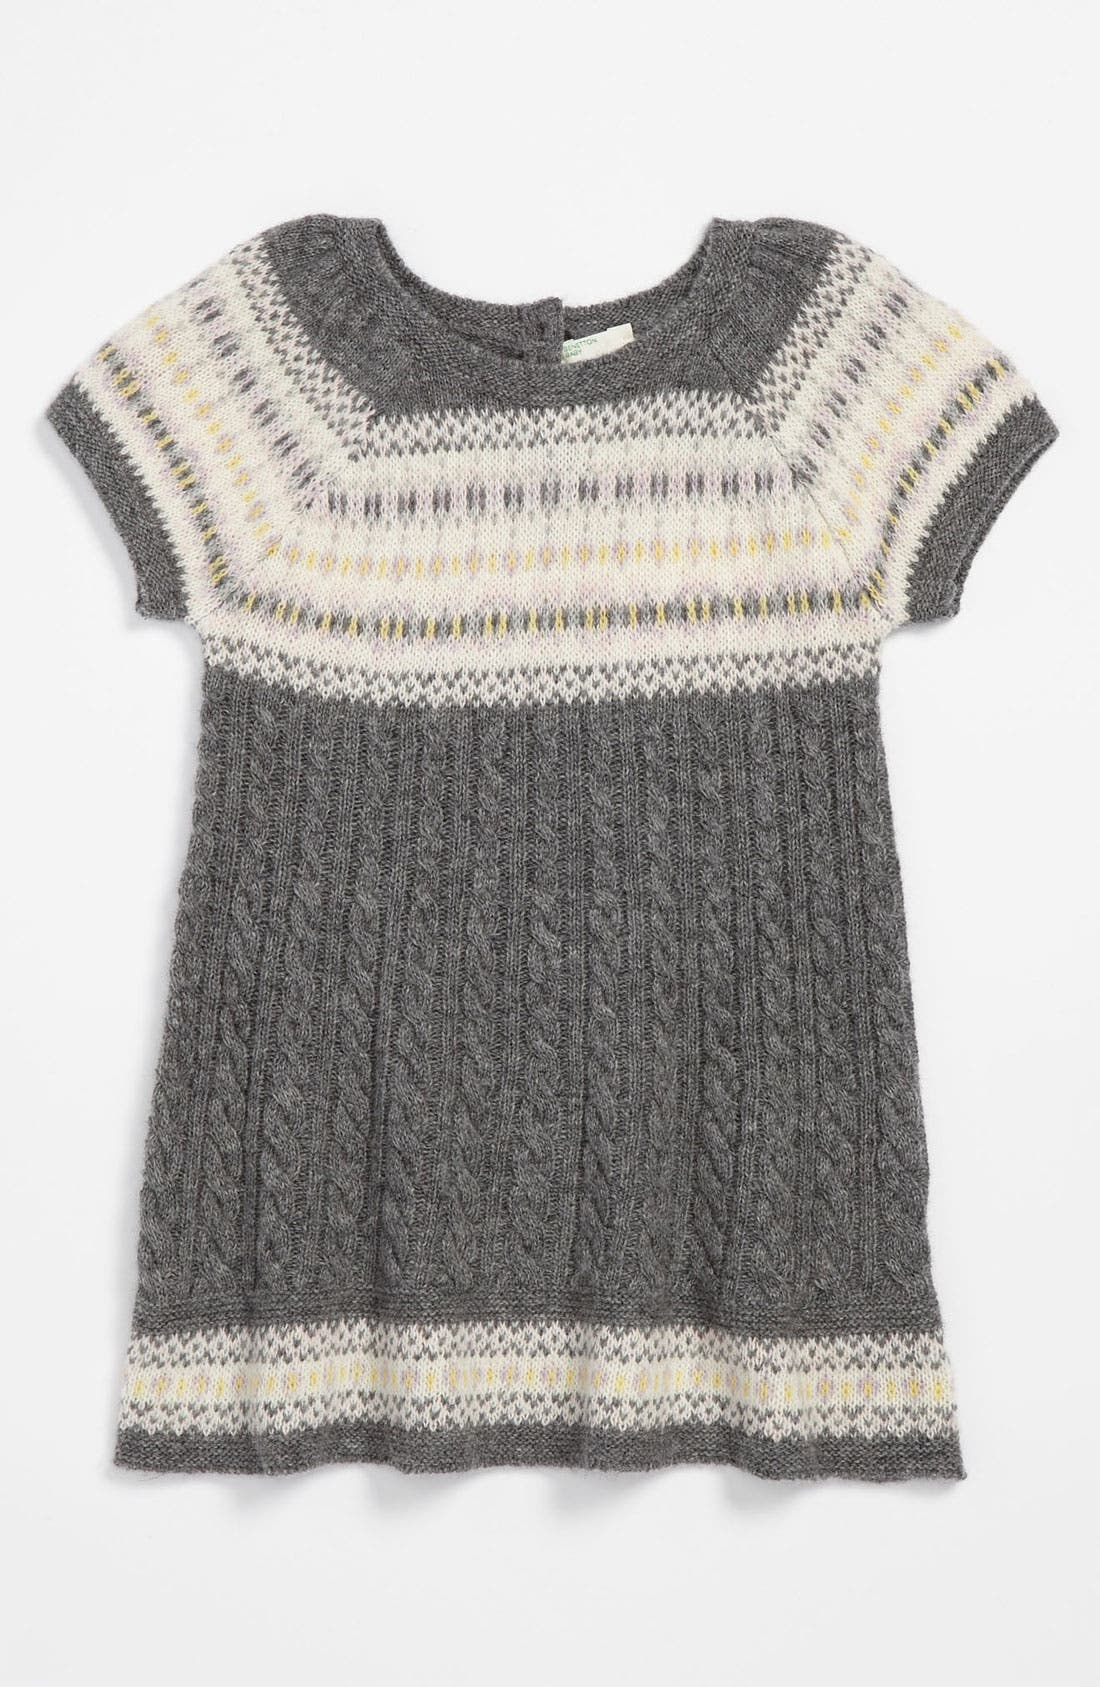 Main Image - United Colors of Benetton Kids Knit Dress (Infant)